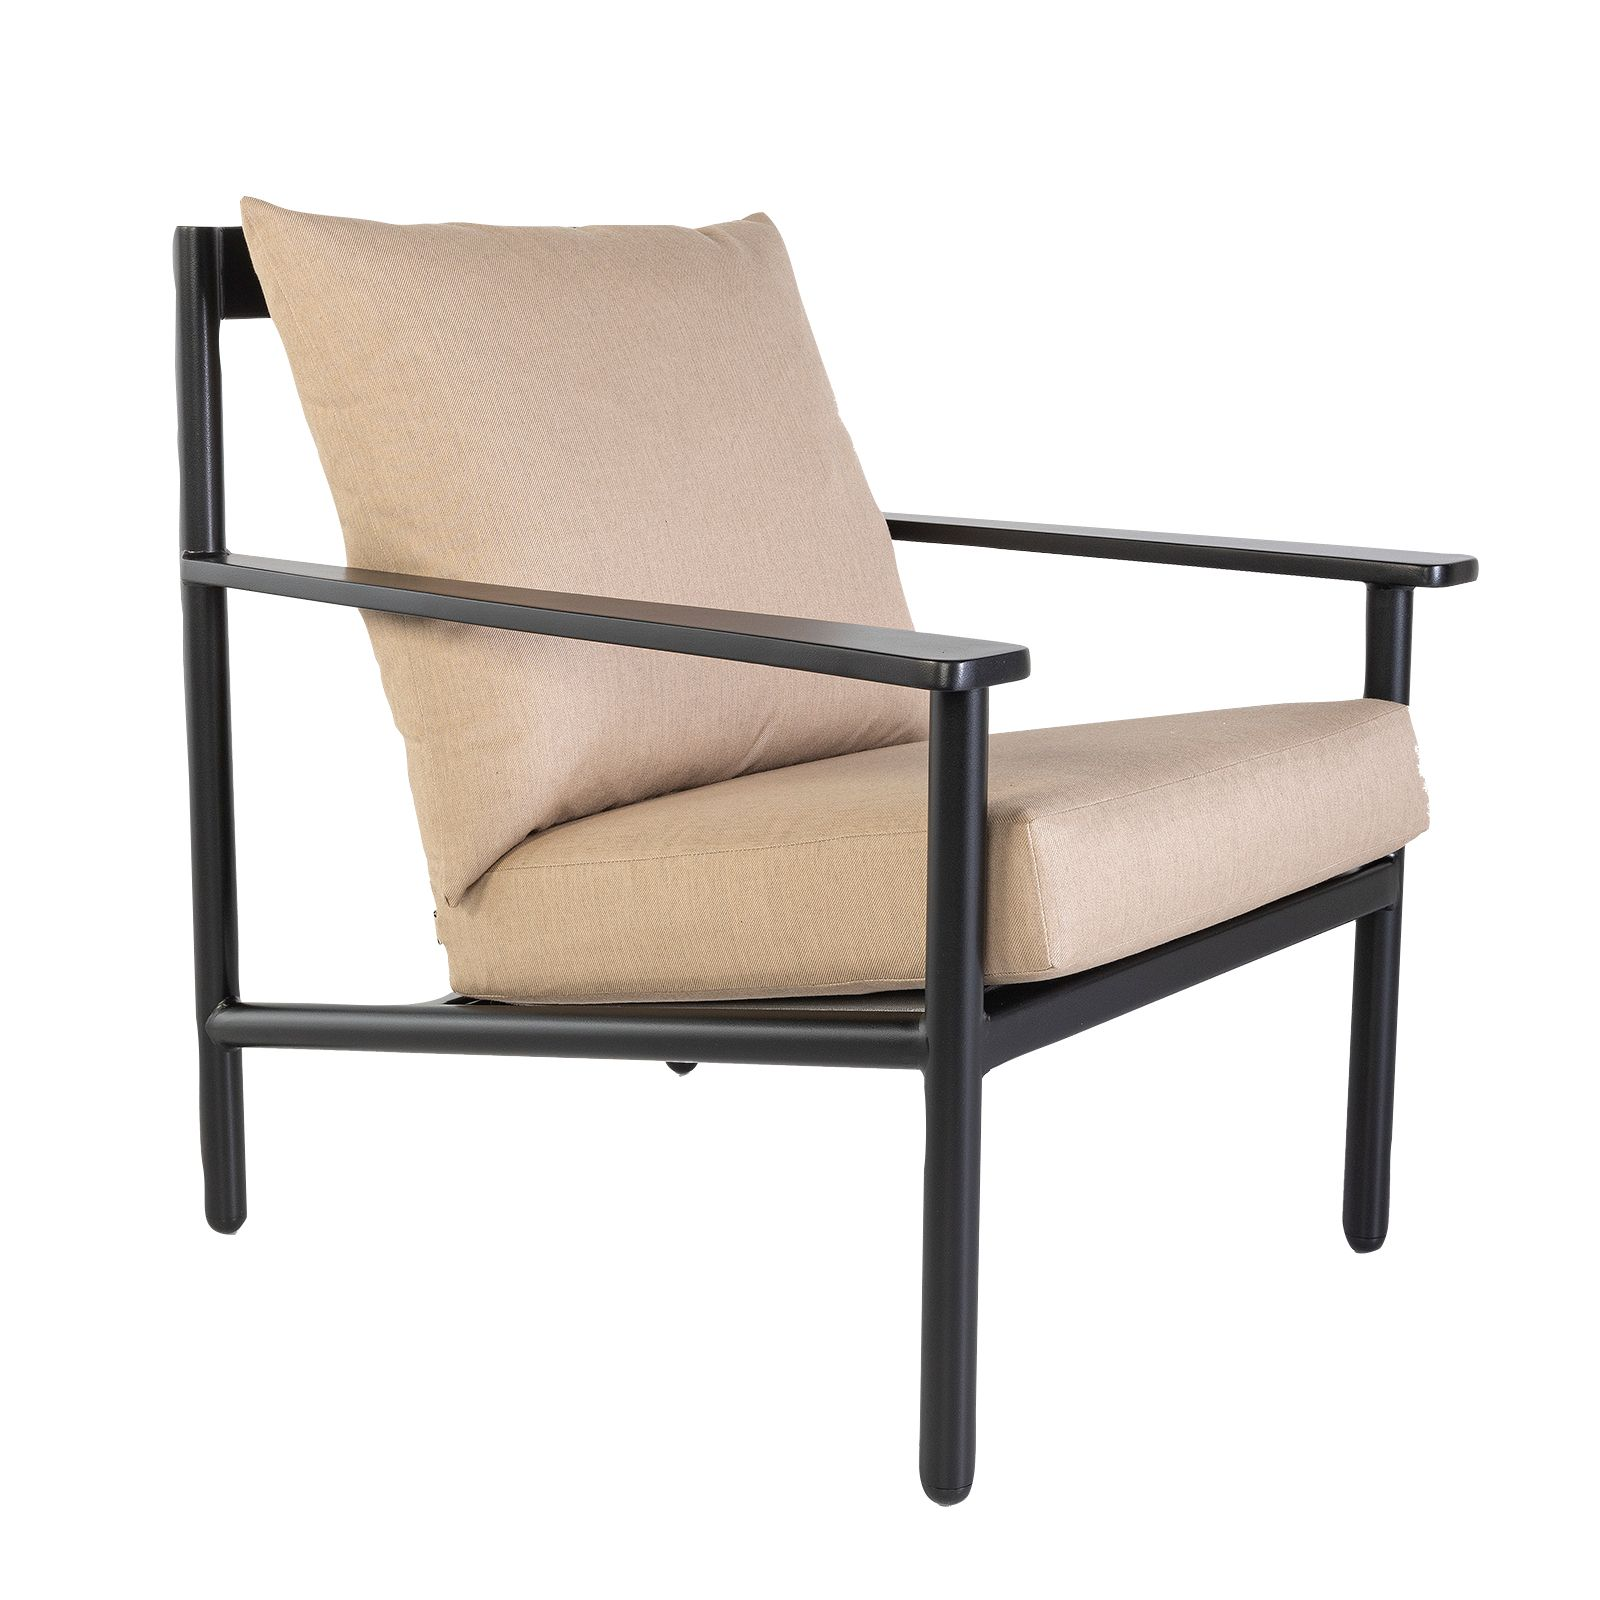 Cibolo Lounge Chair